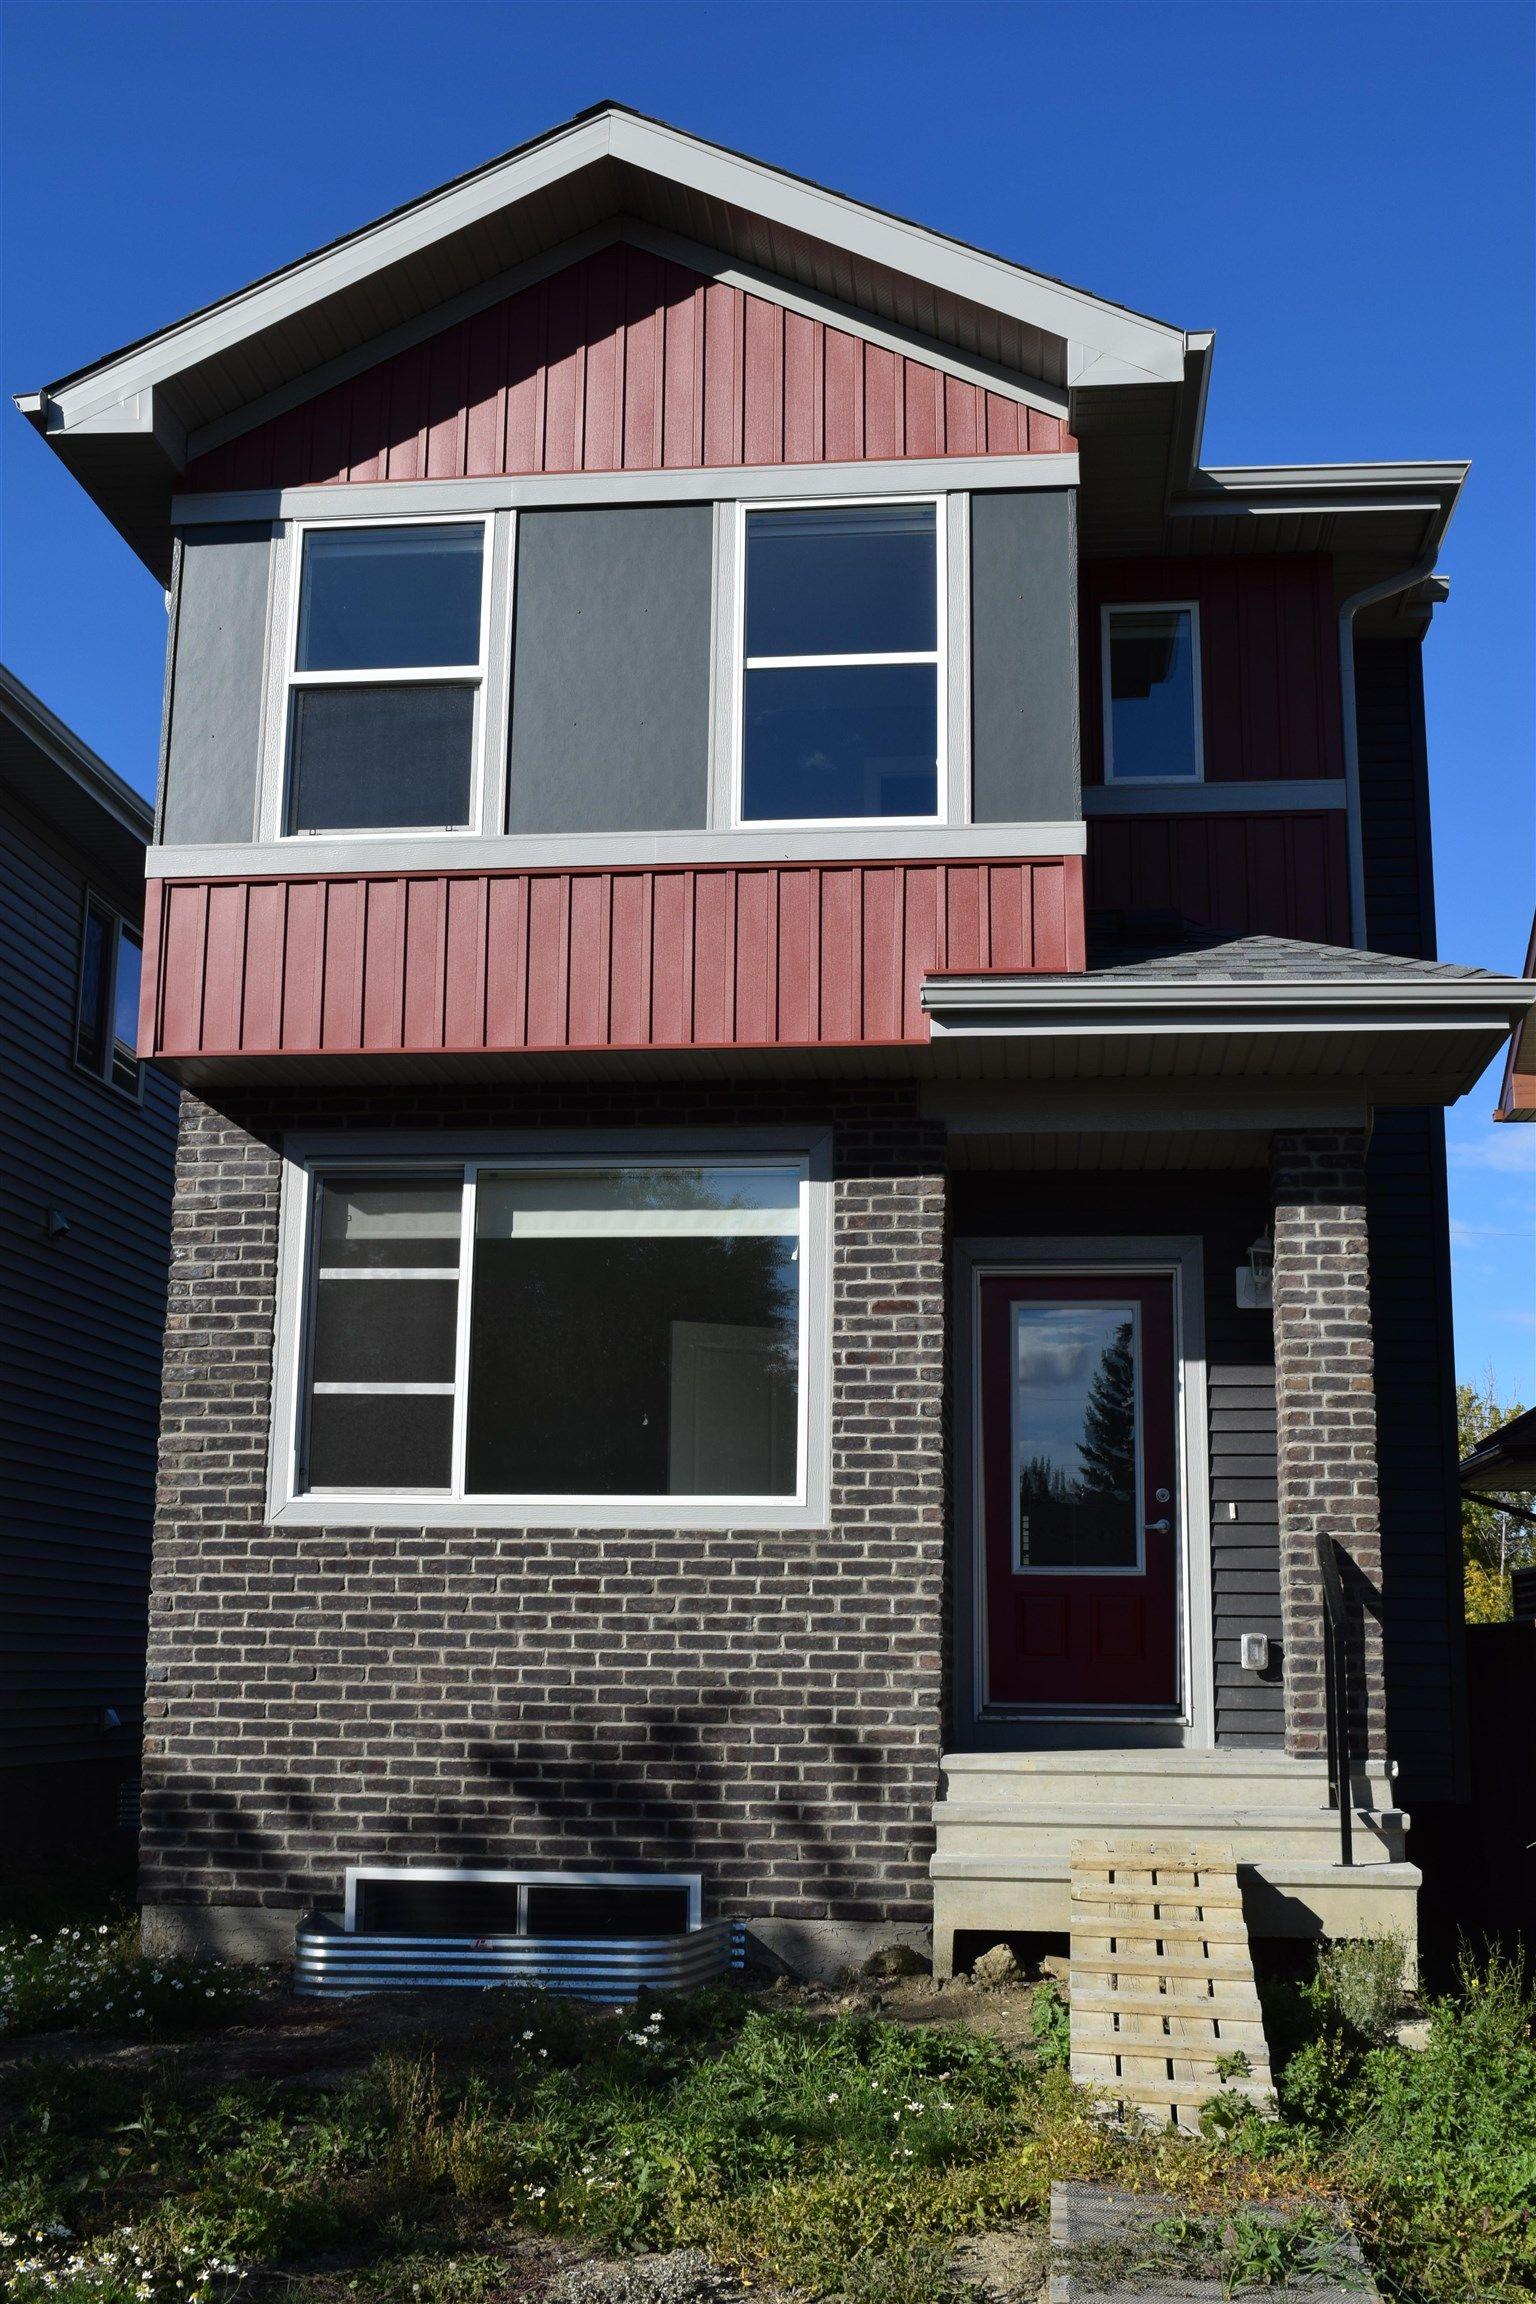 Main Photo: 9116 66 Avenue in Edmonton: Zone 17 House for sale : MLS®# E4263993